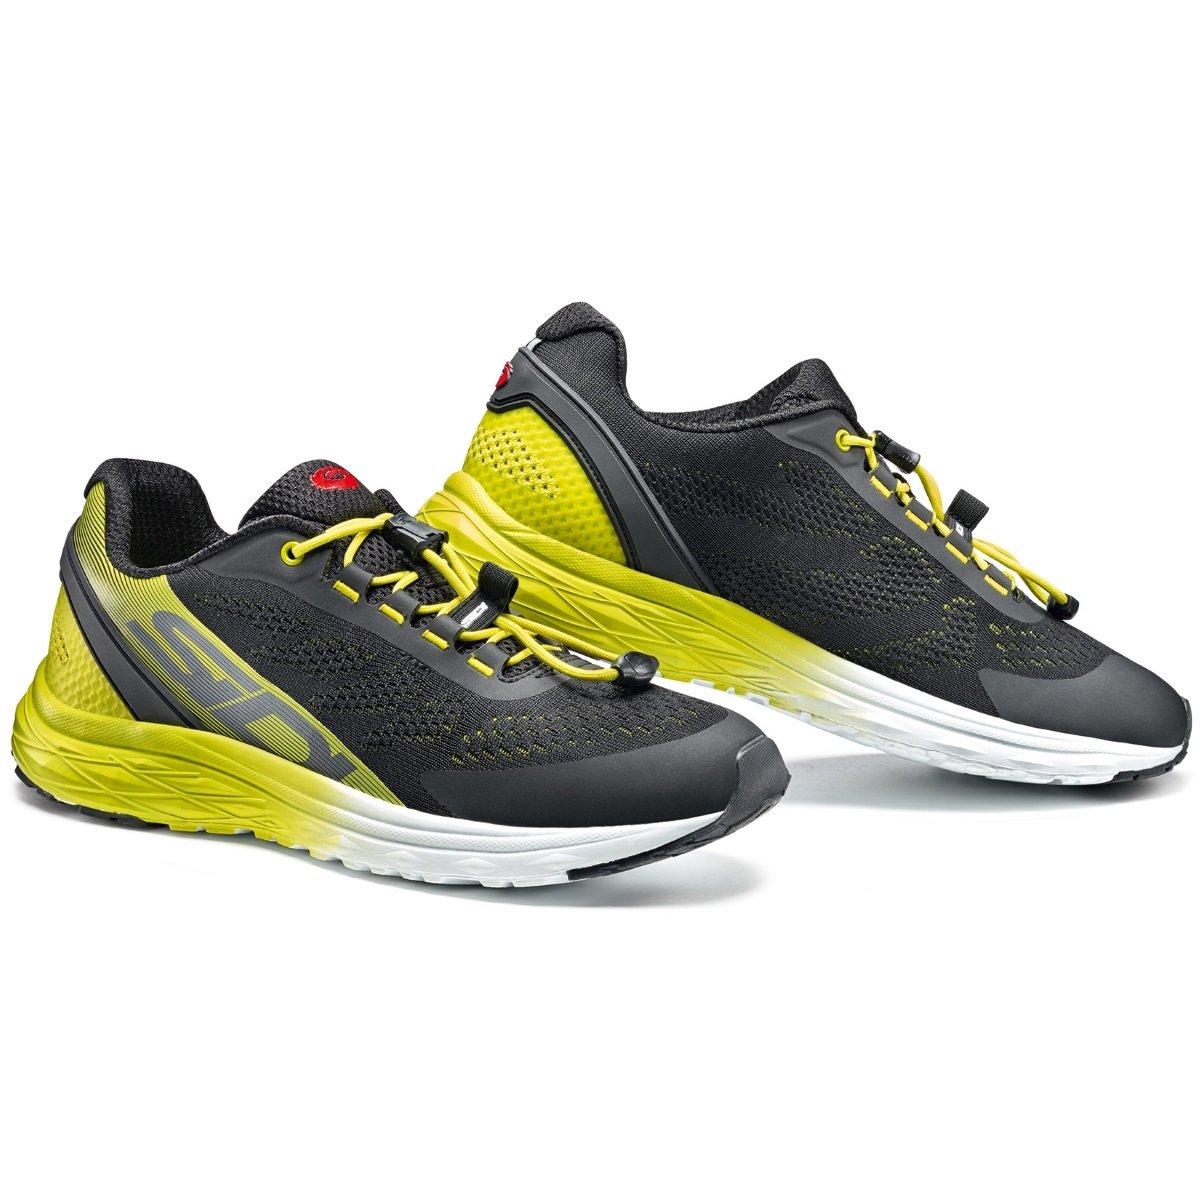 Sidi Arrow black/yellow 38